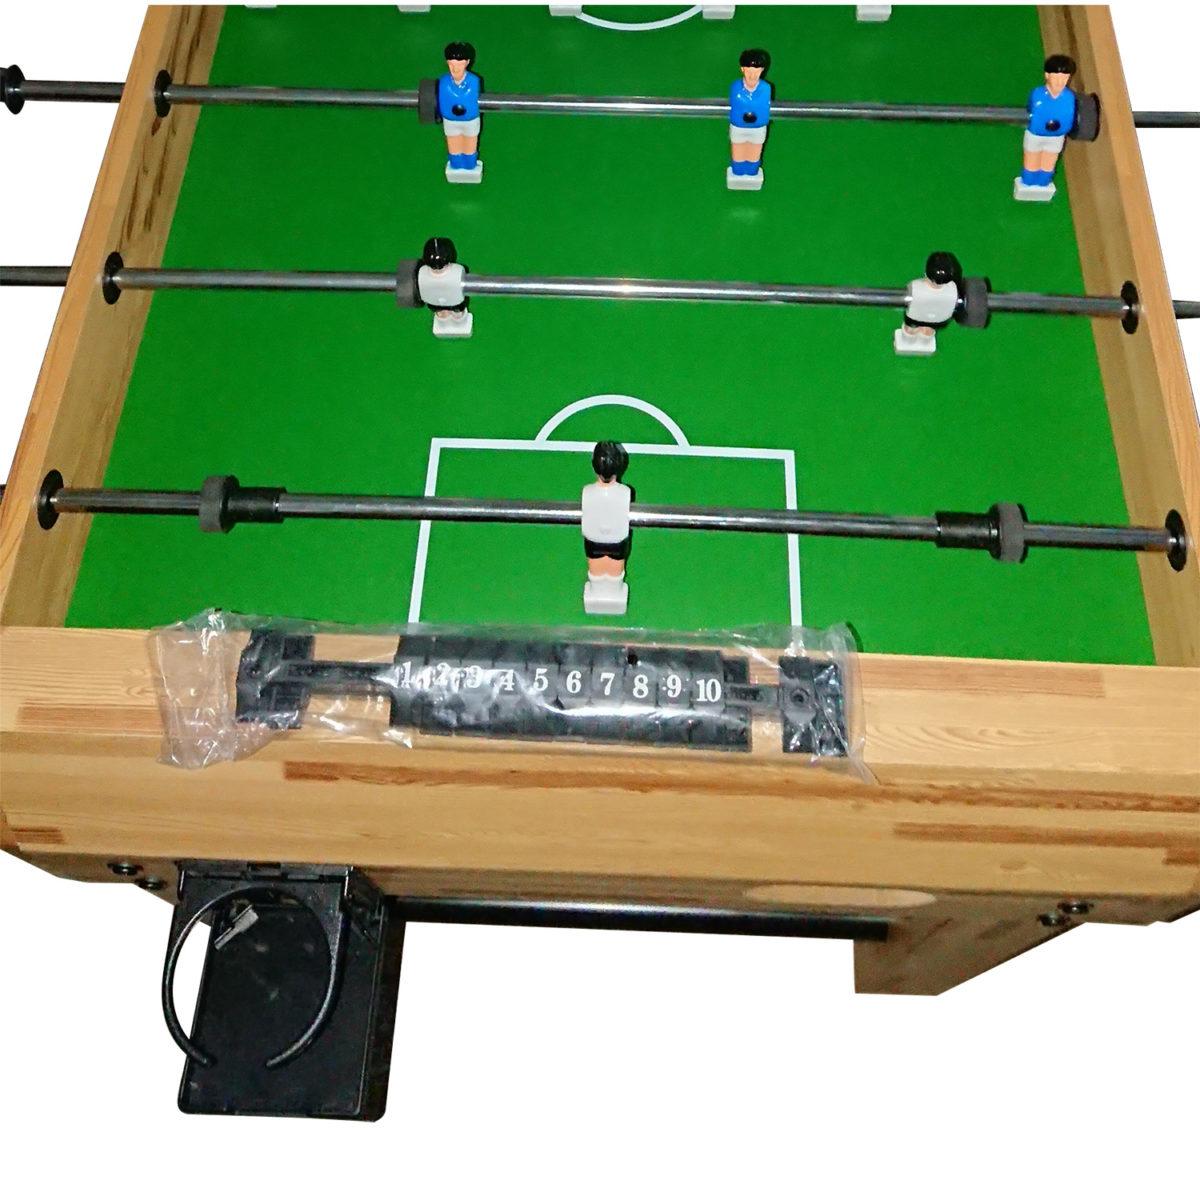 DFC SEVILLA new Игровой стол футбол  HM-ST-48002 - 3